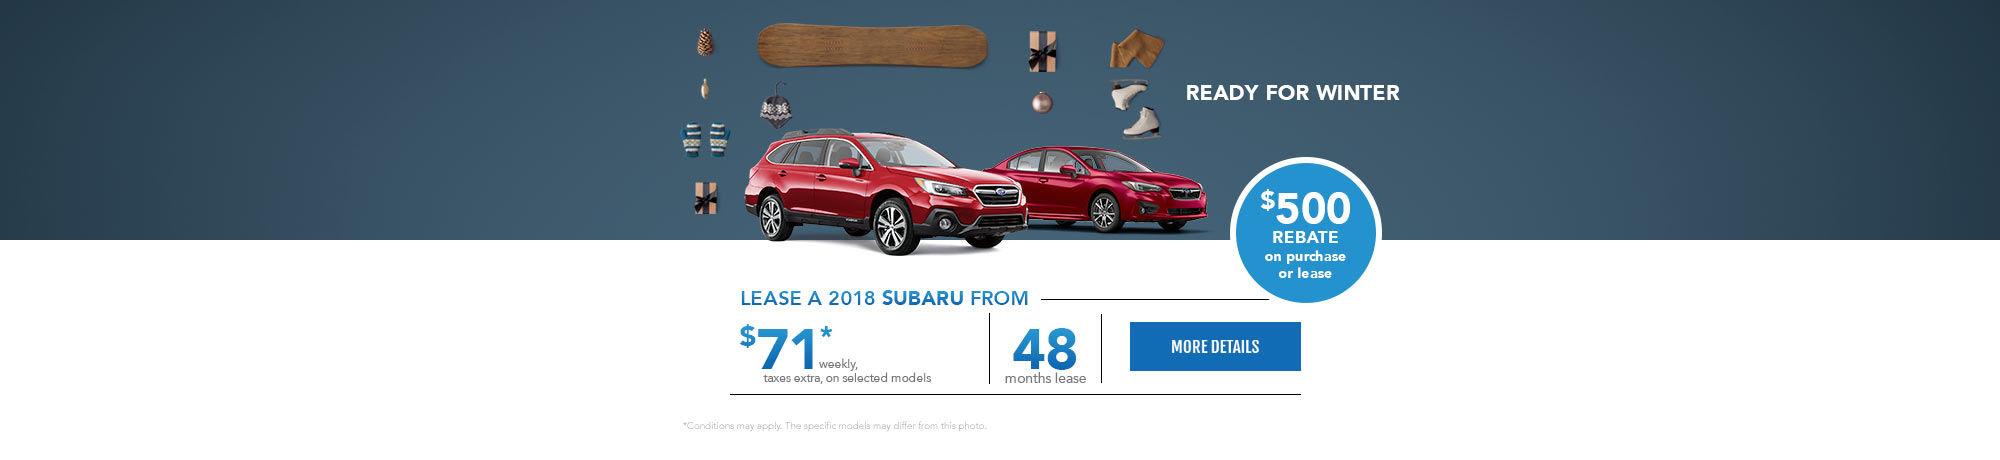 All-New Subaru